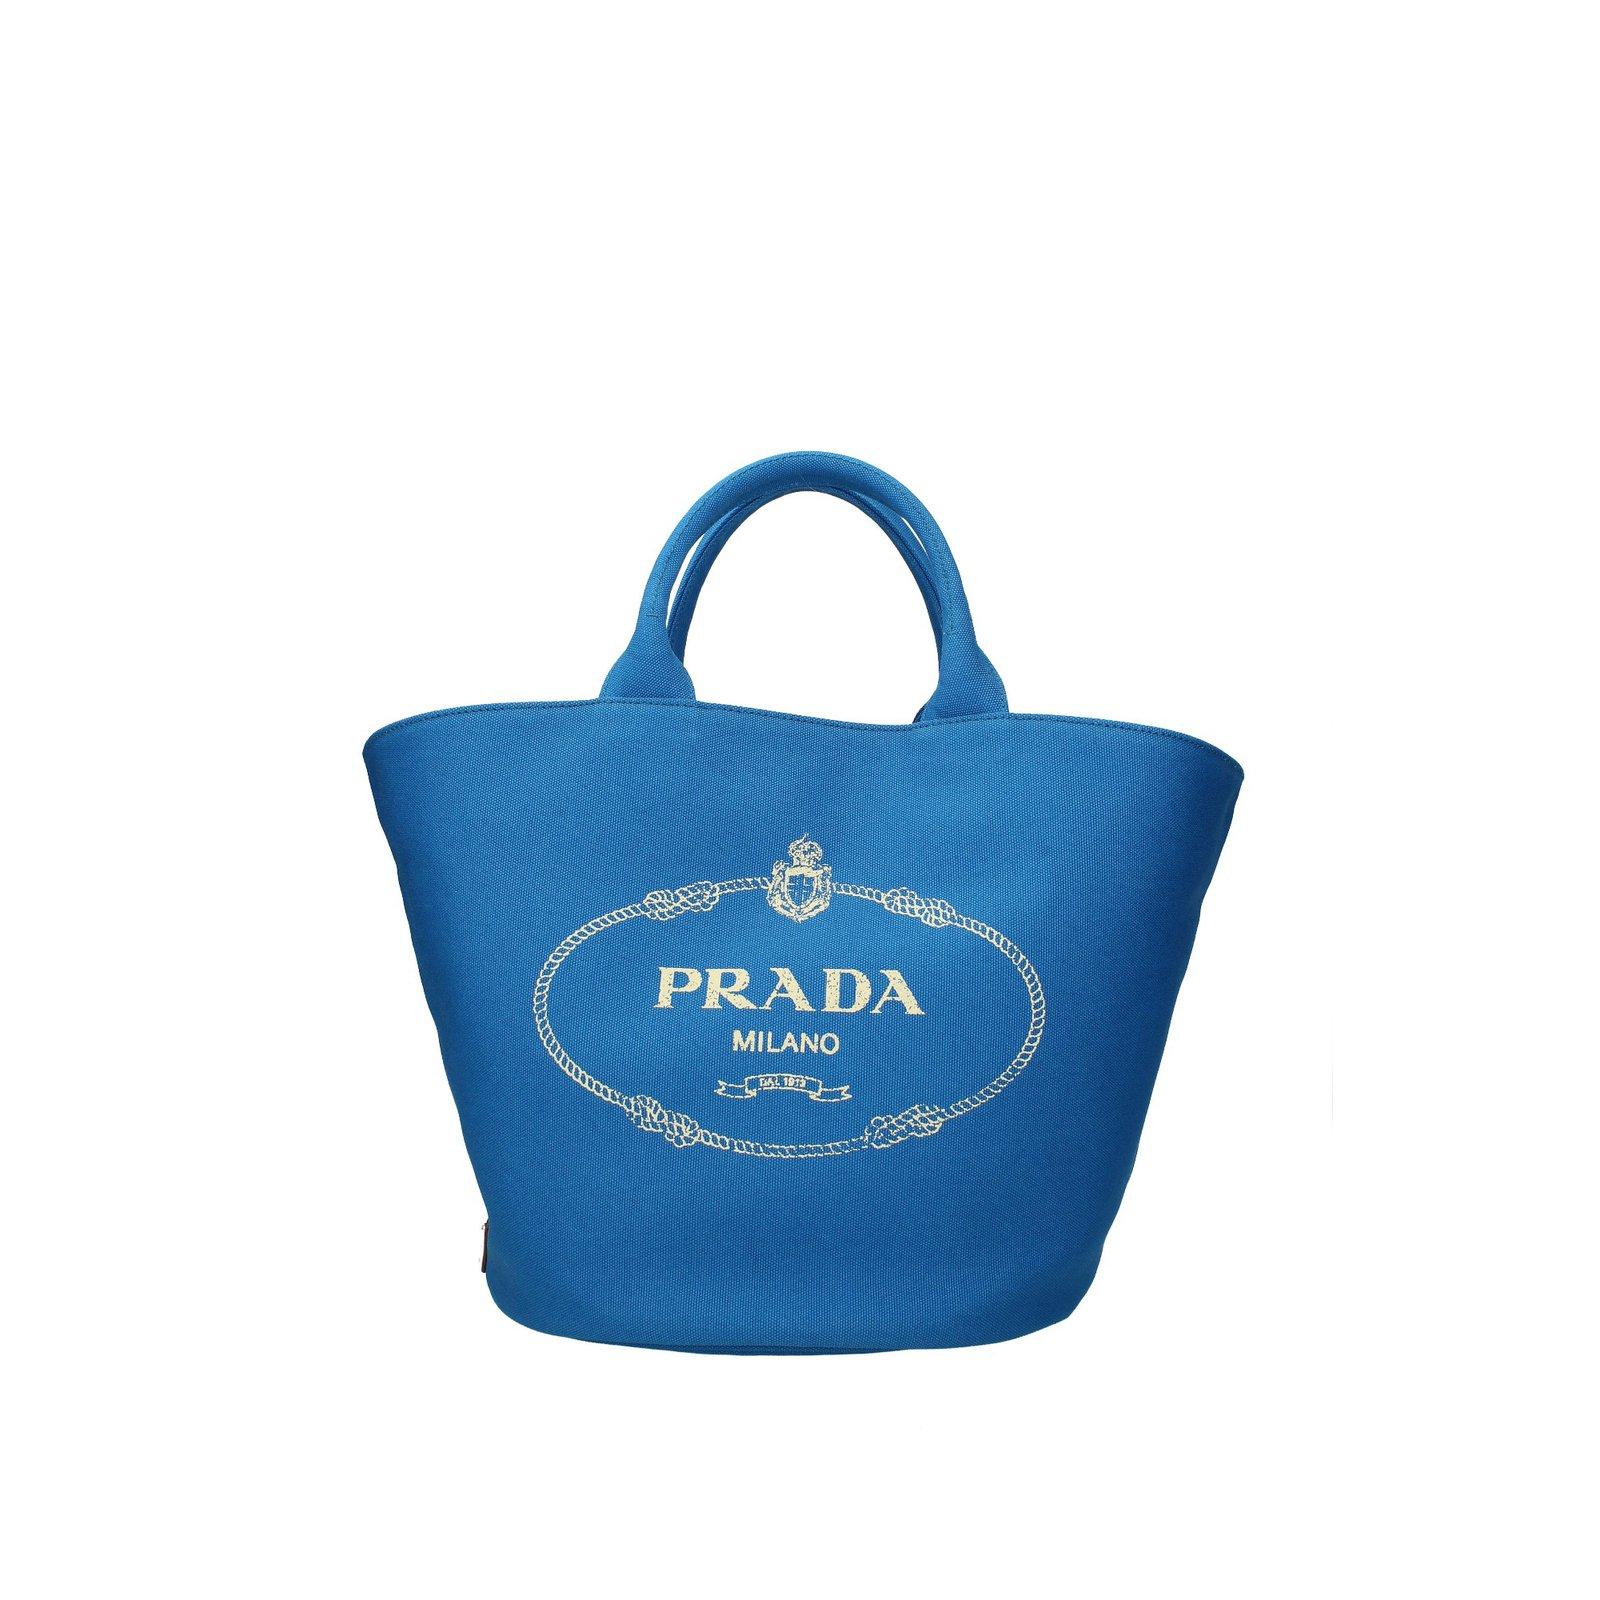 46242404b4f1 Prada Bag Handbags Other Blue ref.75160 - Joli Closet